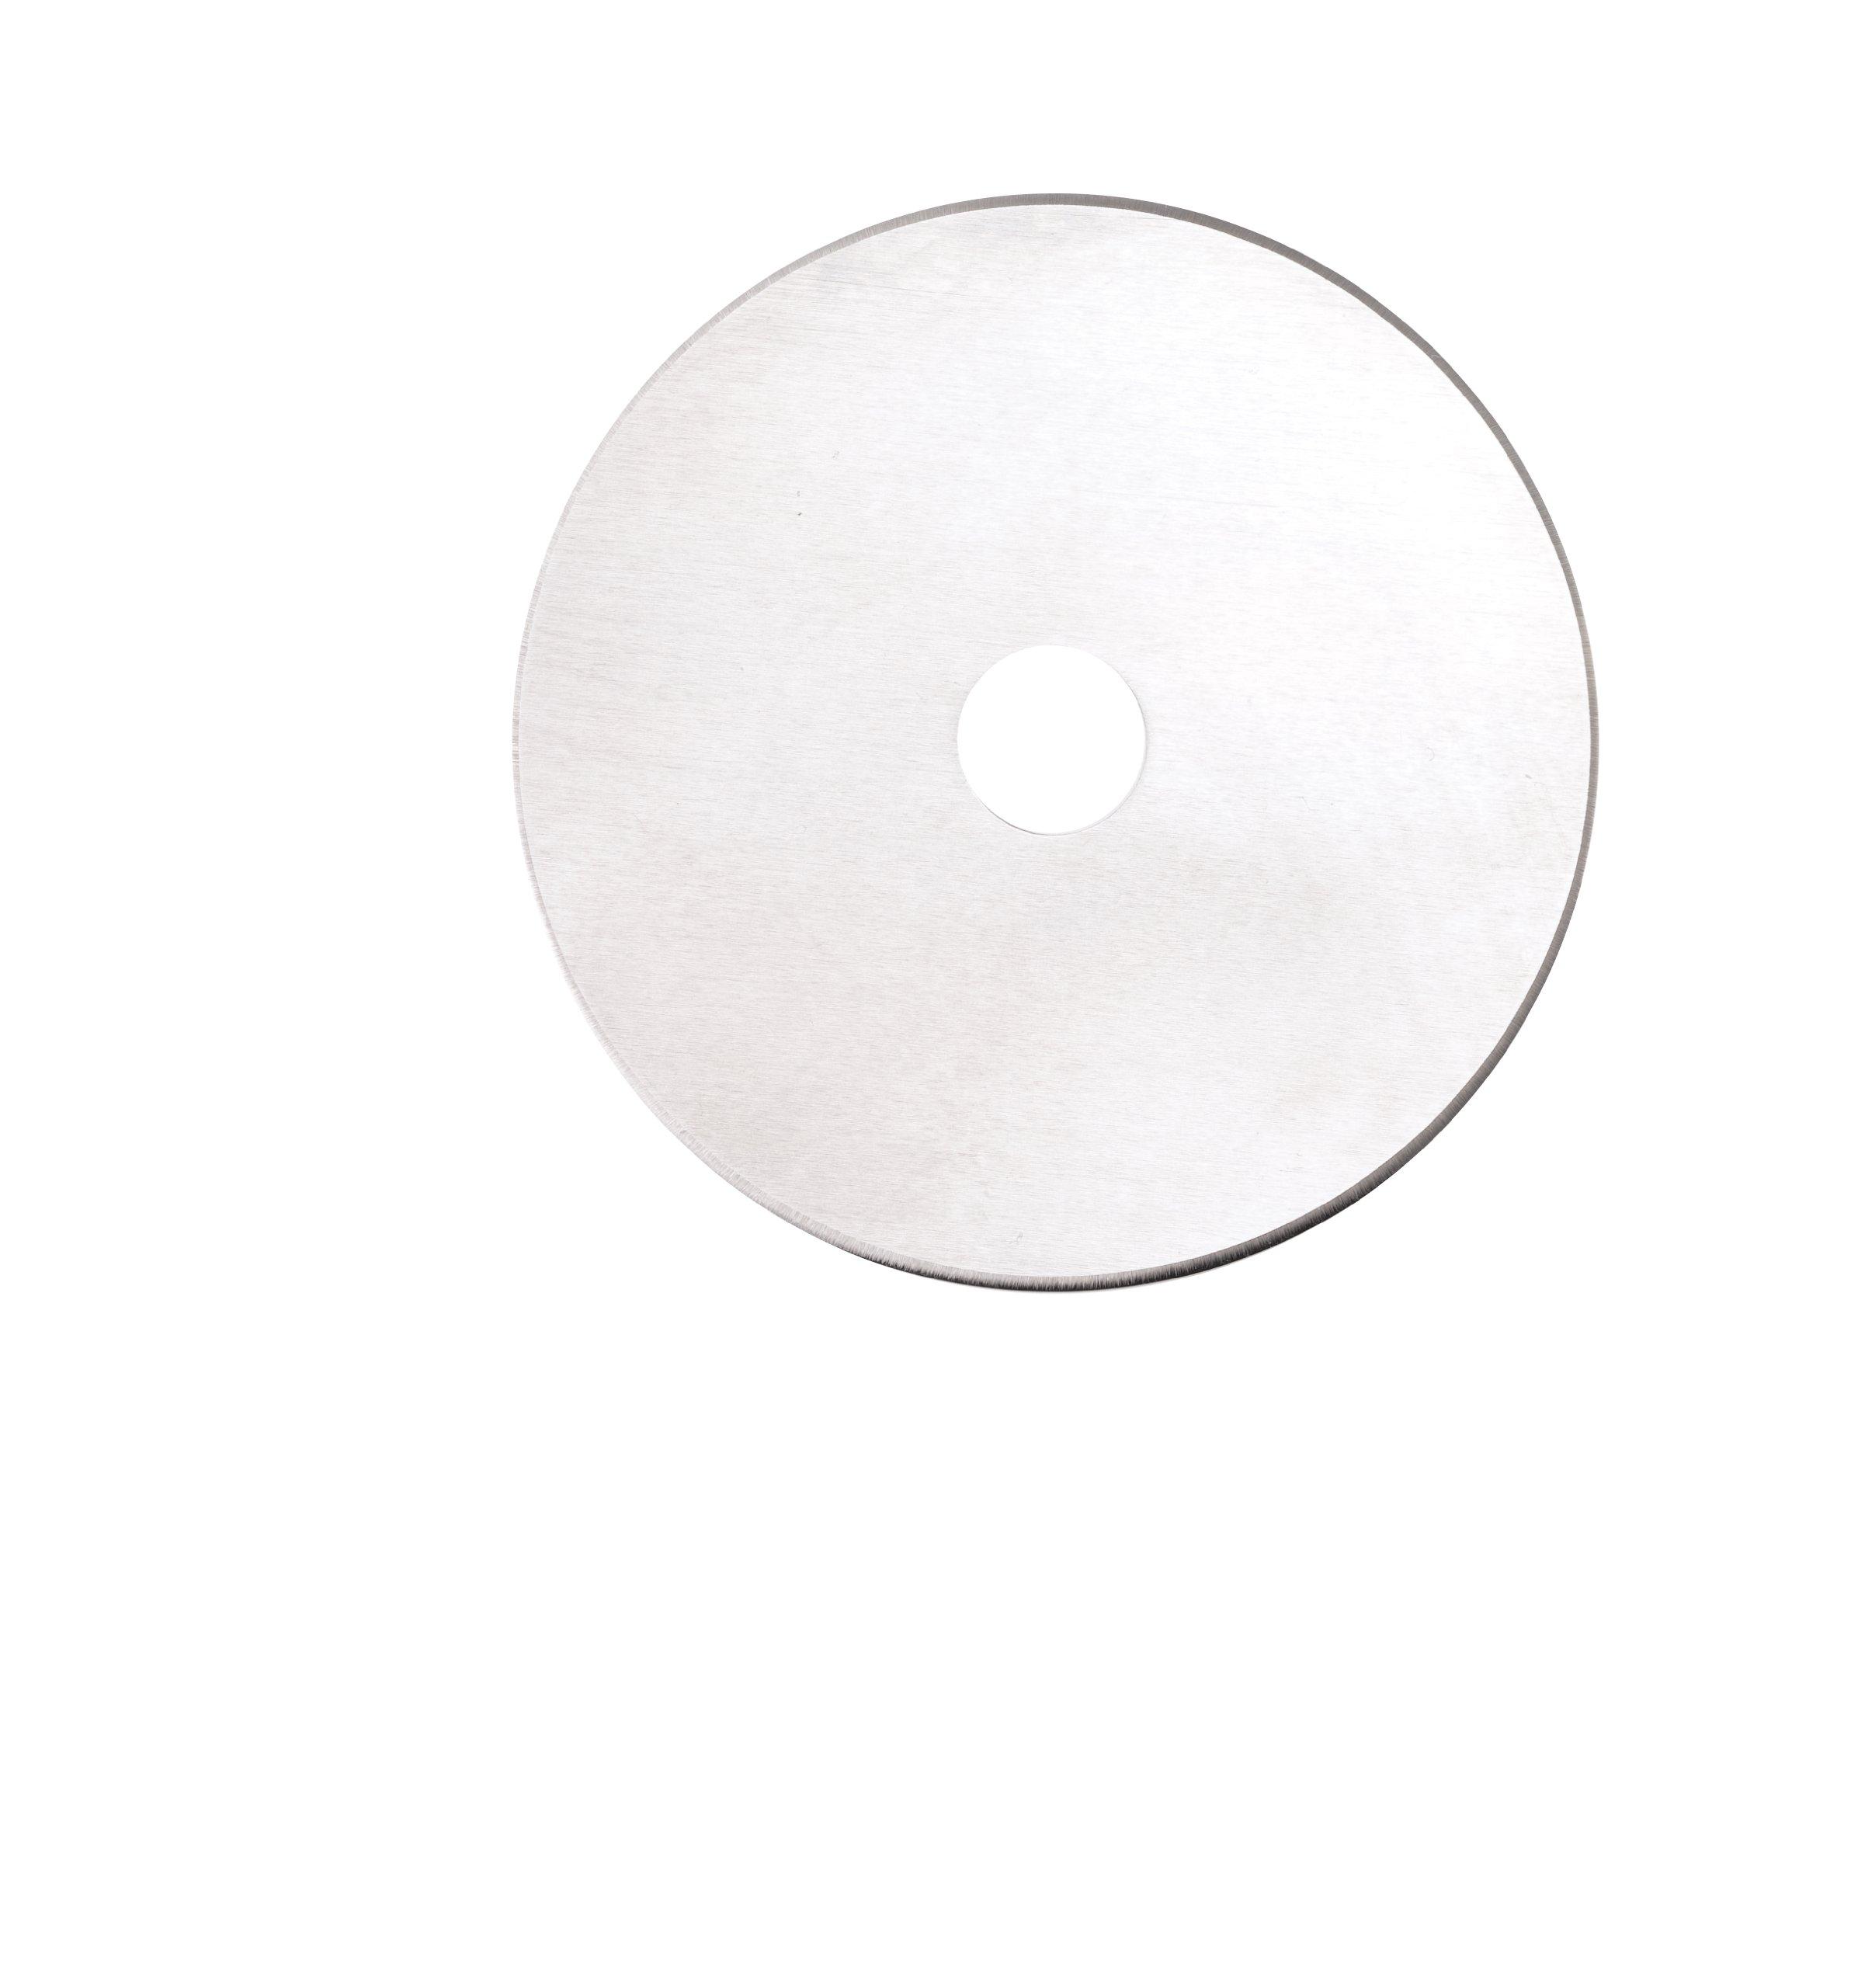 Cuchillas giratorias de titanio Fiskars, 60 mm, paquete de 2